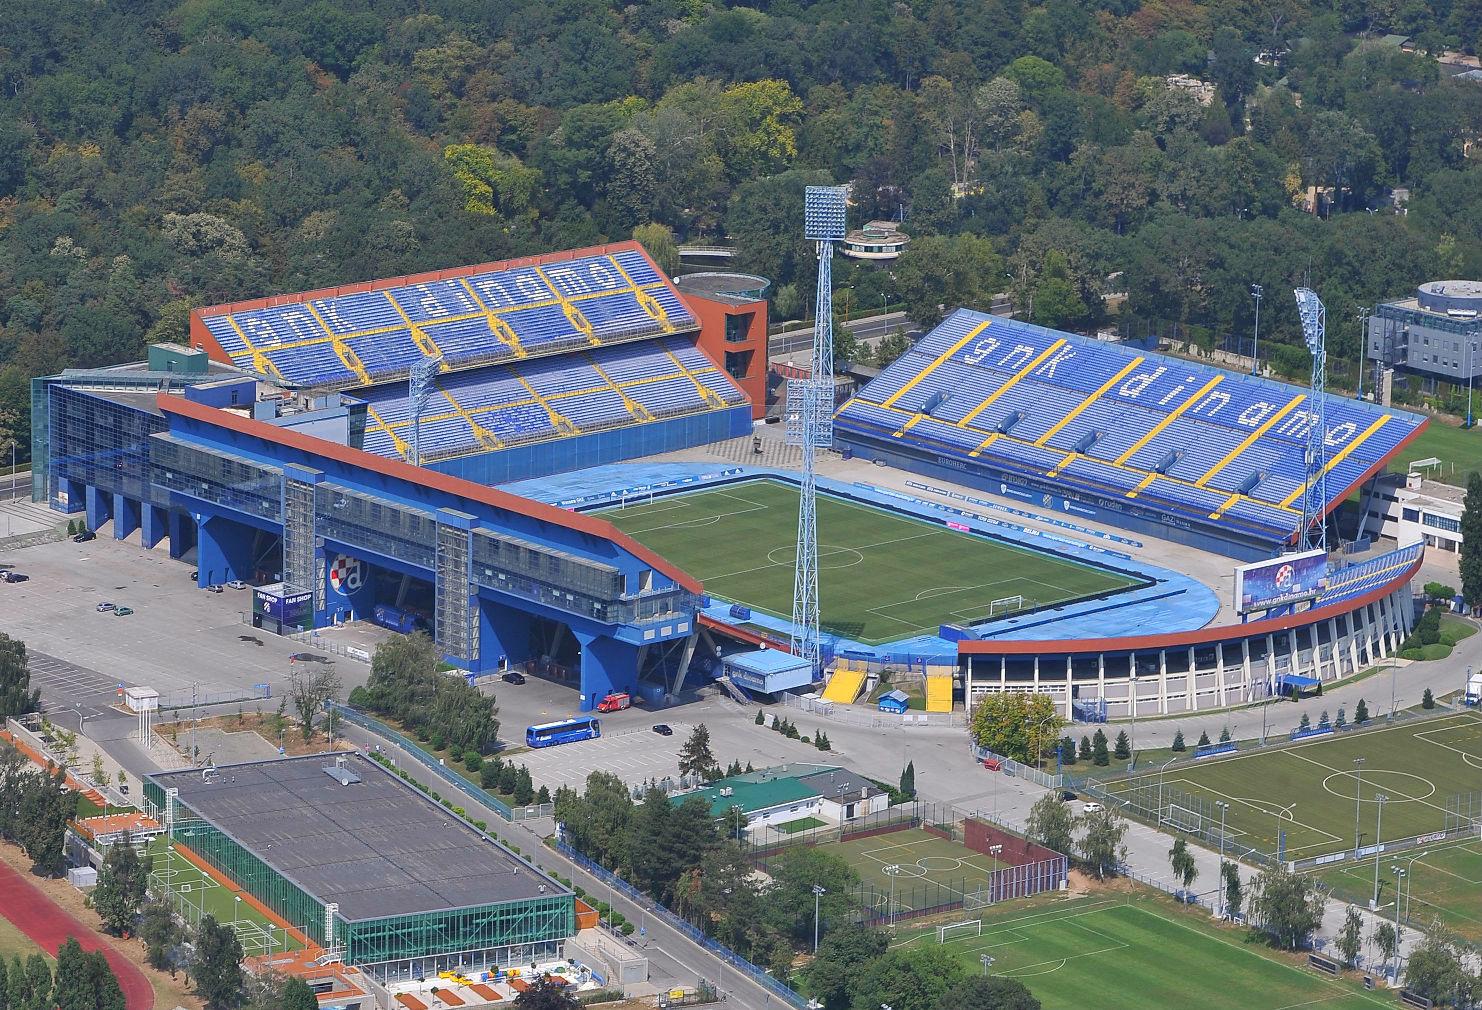 UEFA ne da Crnogorcima da na Maksimiru budu domaćini